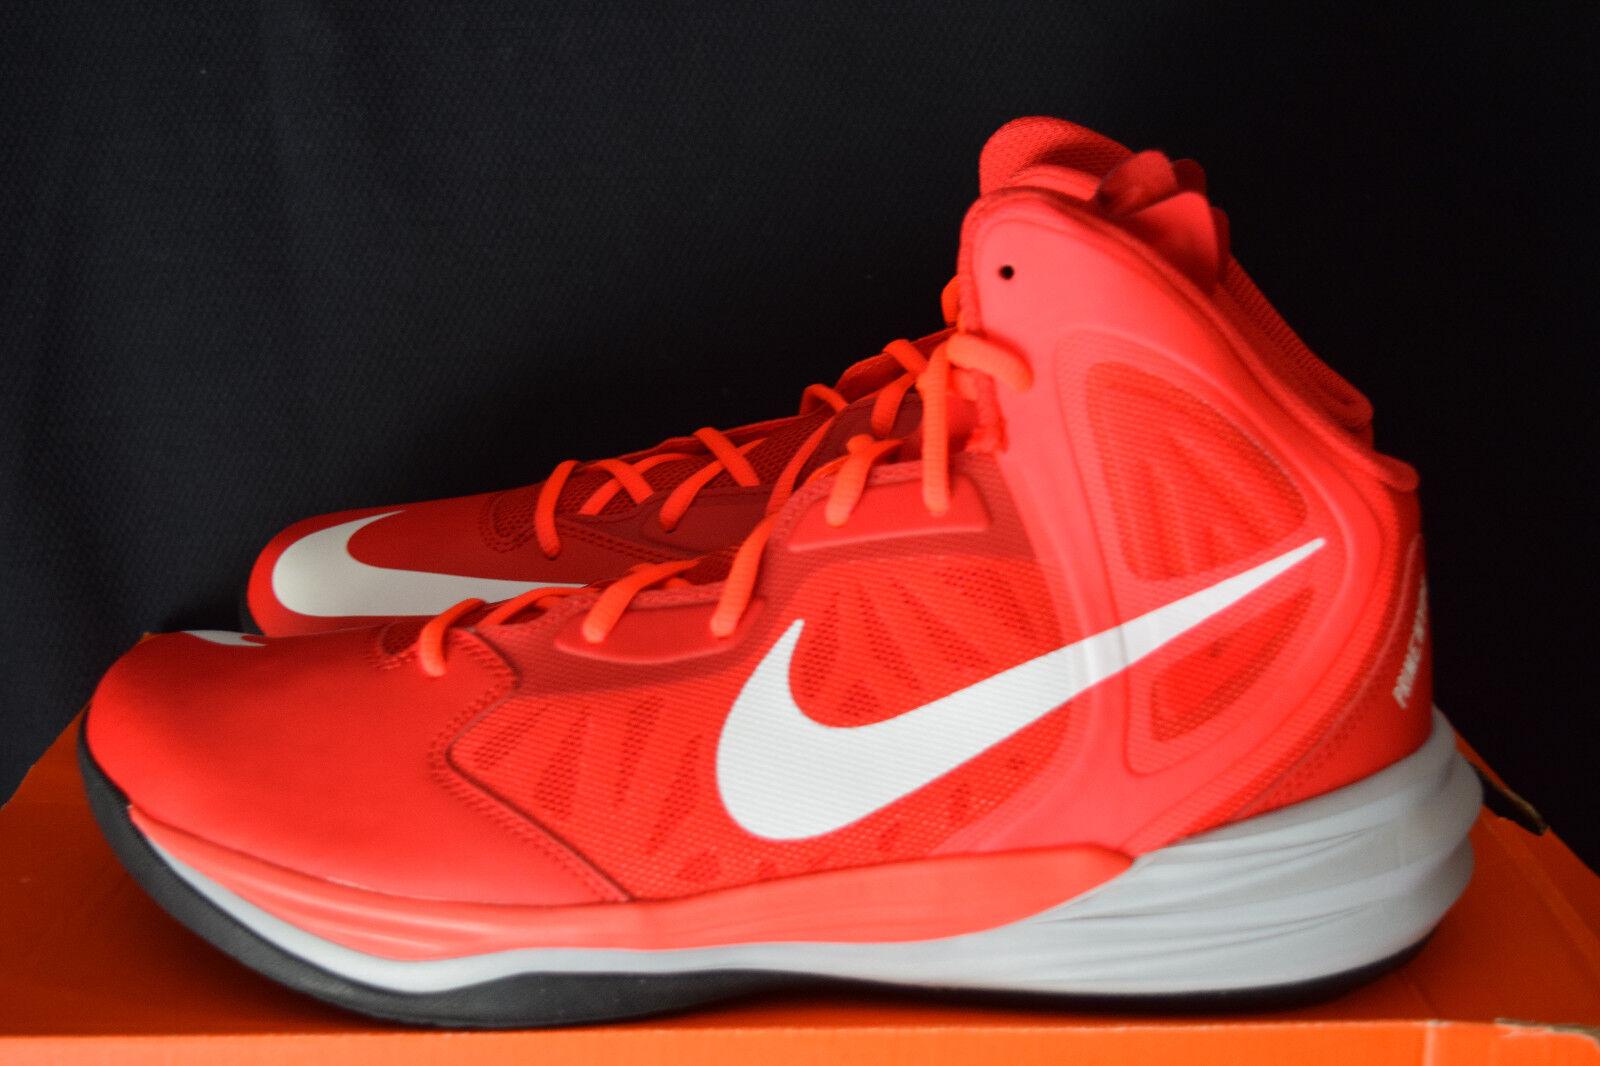 New in box nike prime - hype - mens 13 ersten basketball - schuhe im ersten 13 team rot - weiß - ca714e